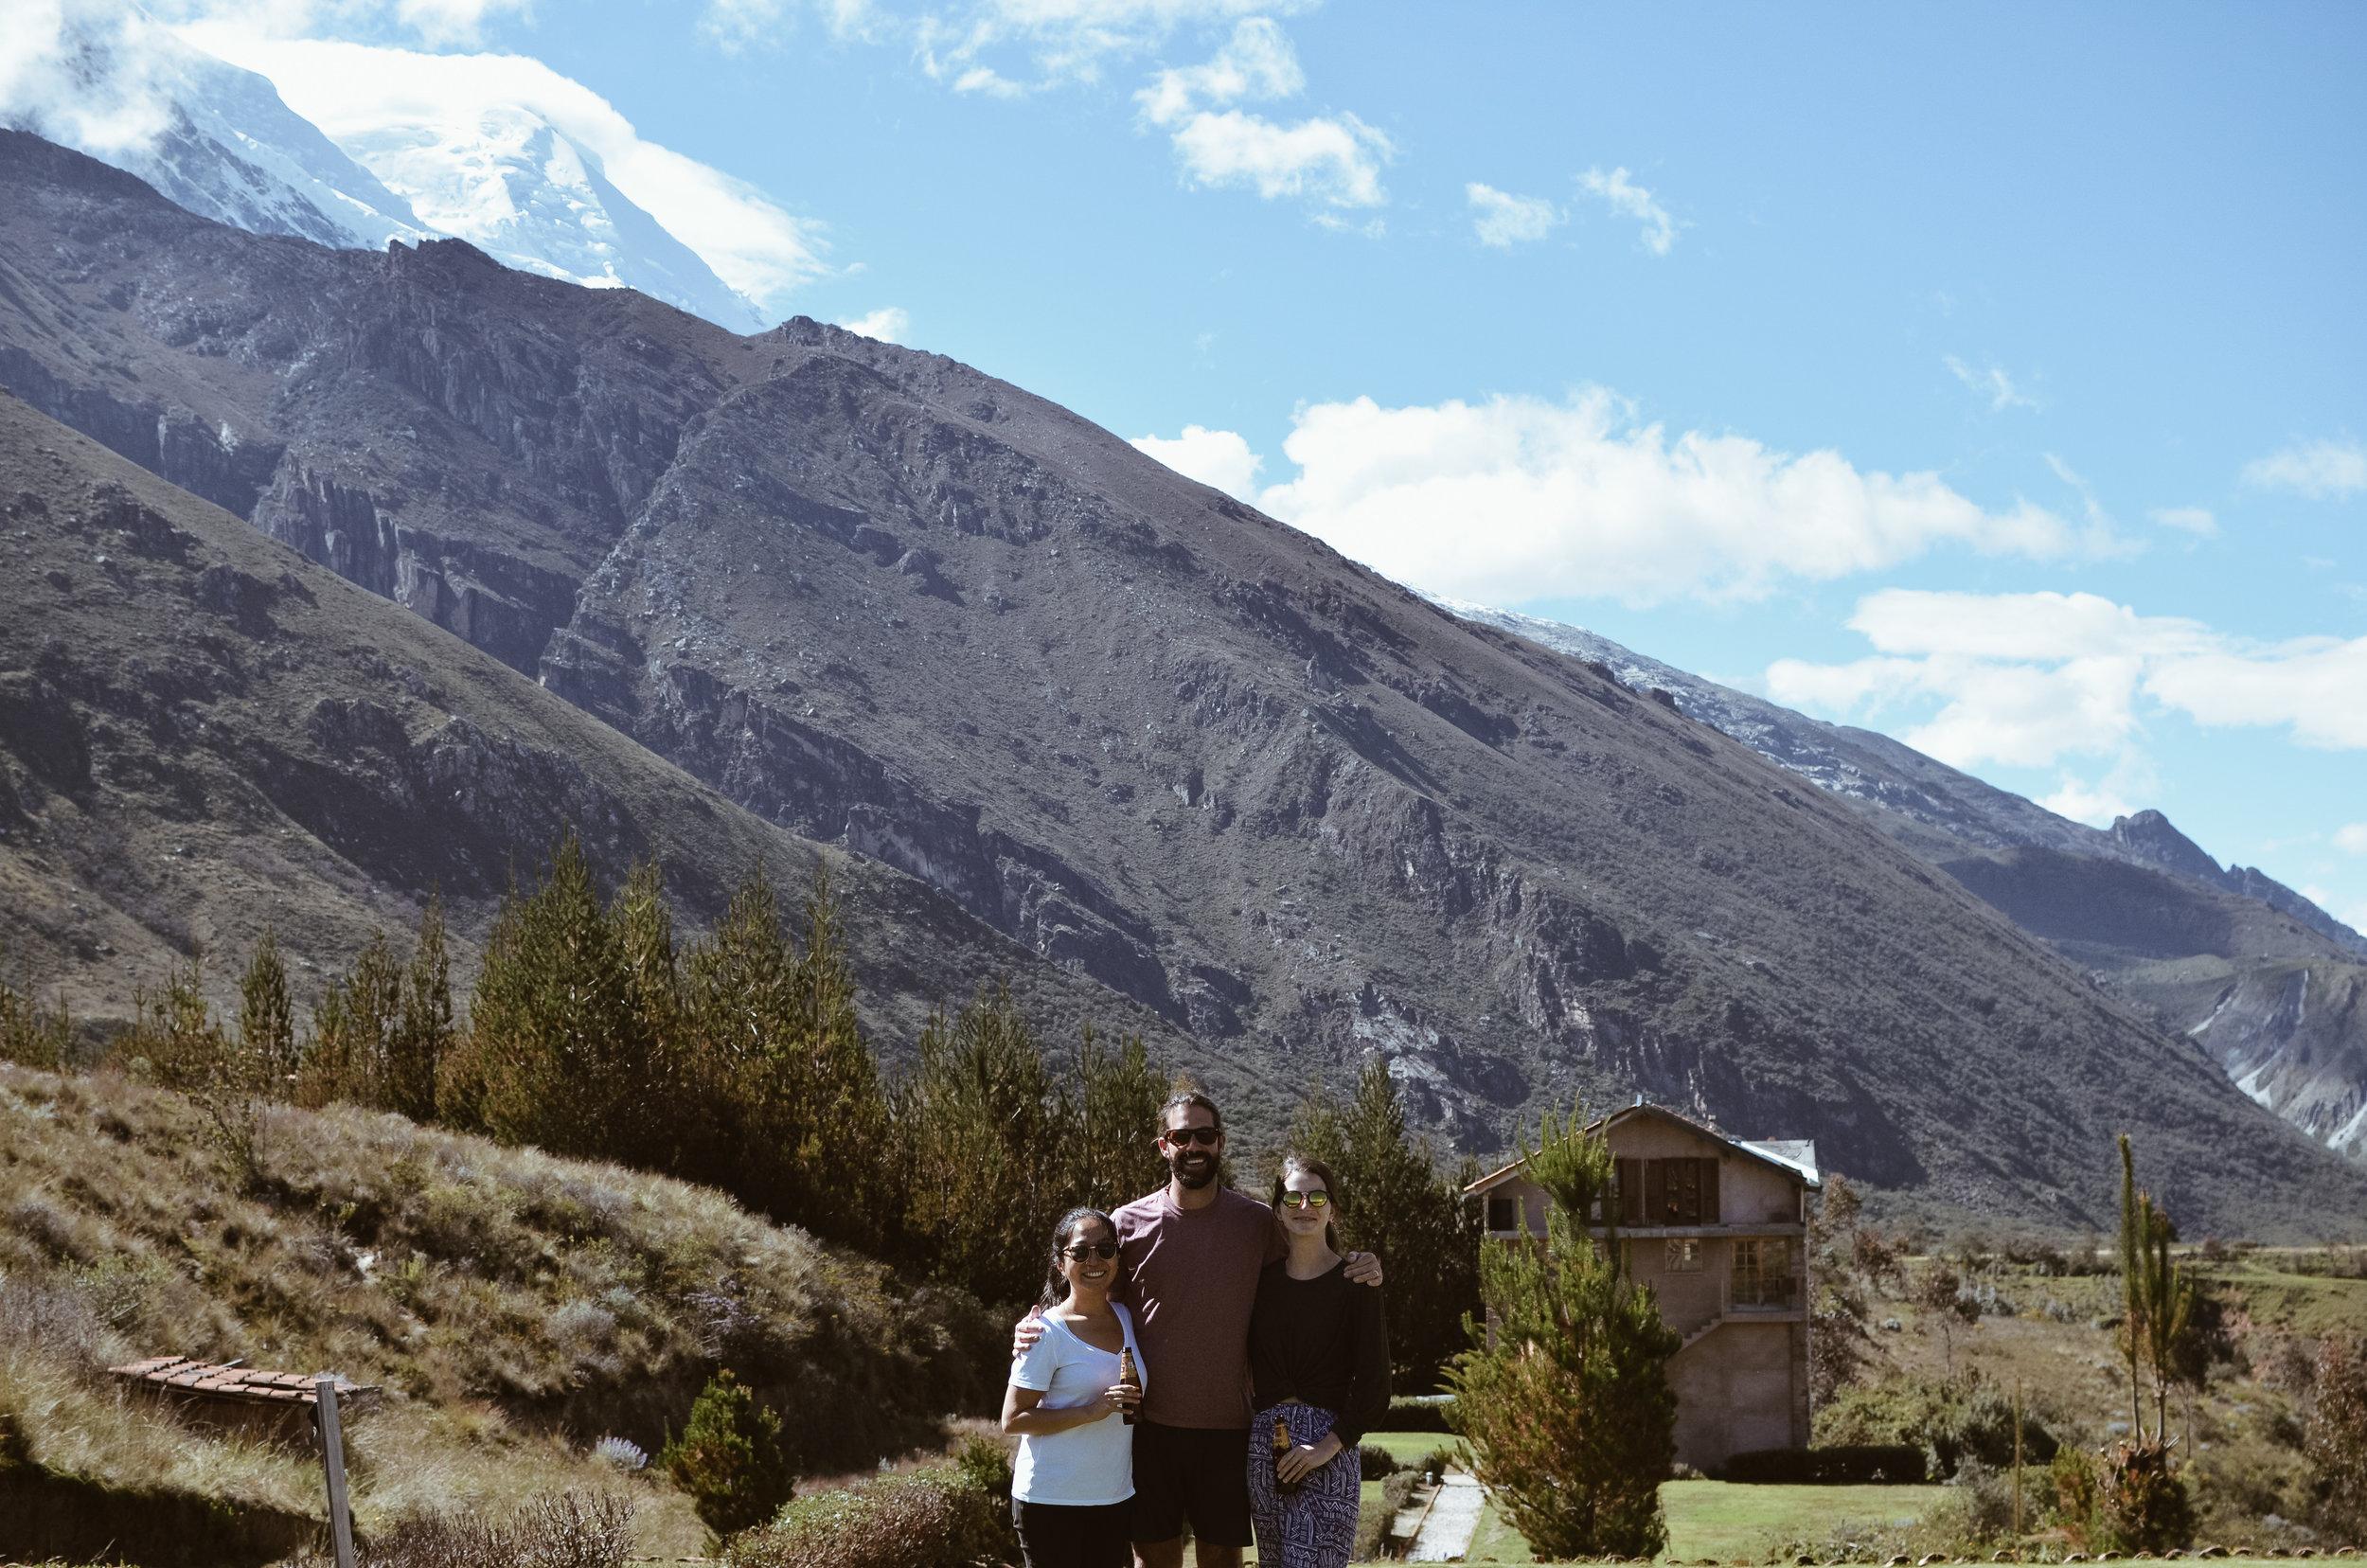 laguna+lake+69+hike+peru+travel+guide+life+on+pine_DSC_0665.jpg